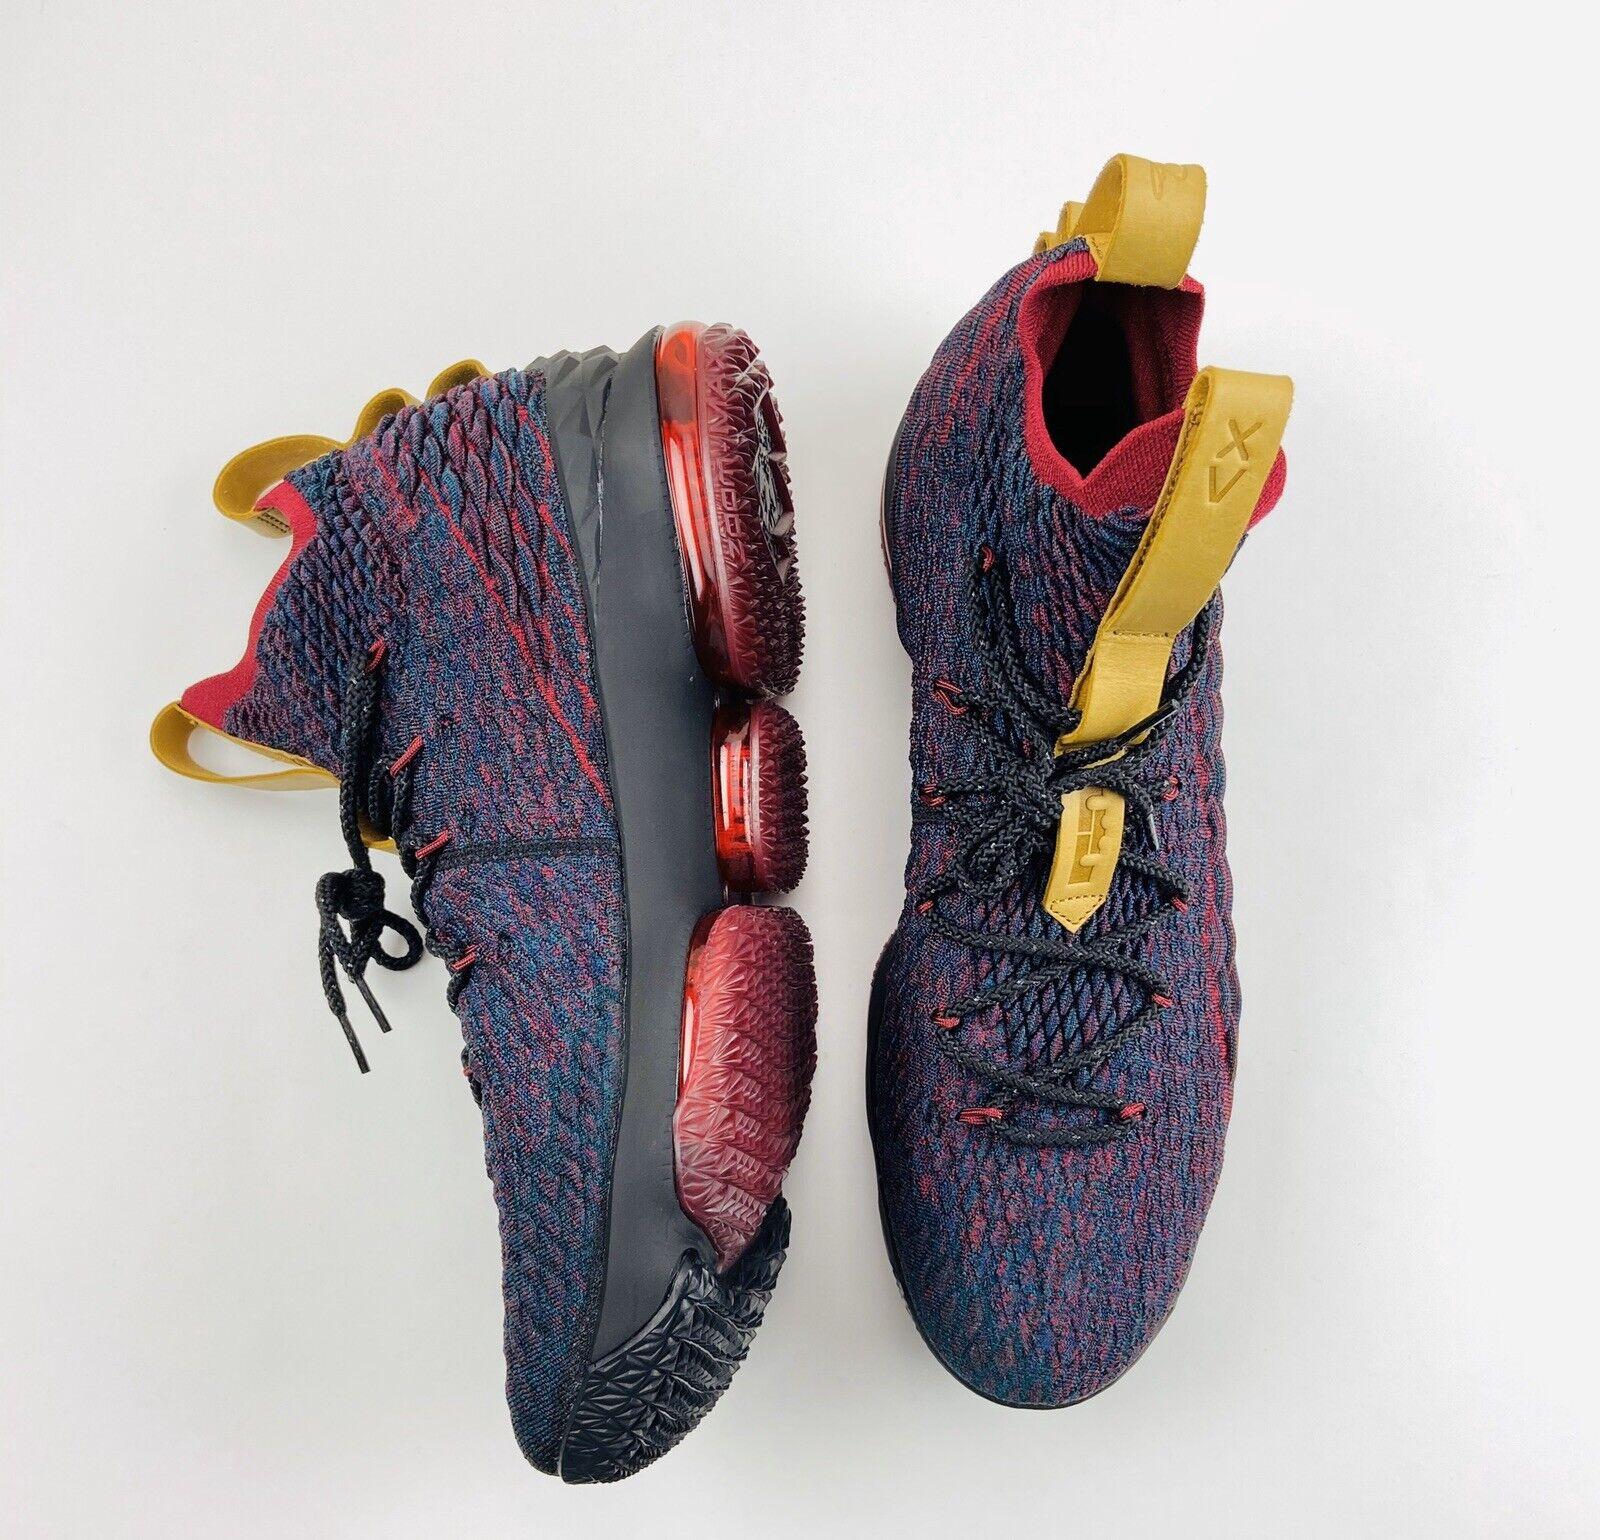 Nike LeBron 15 купить на eBay в Америке